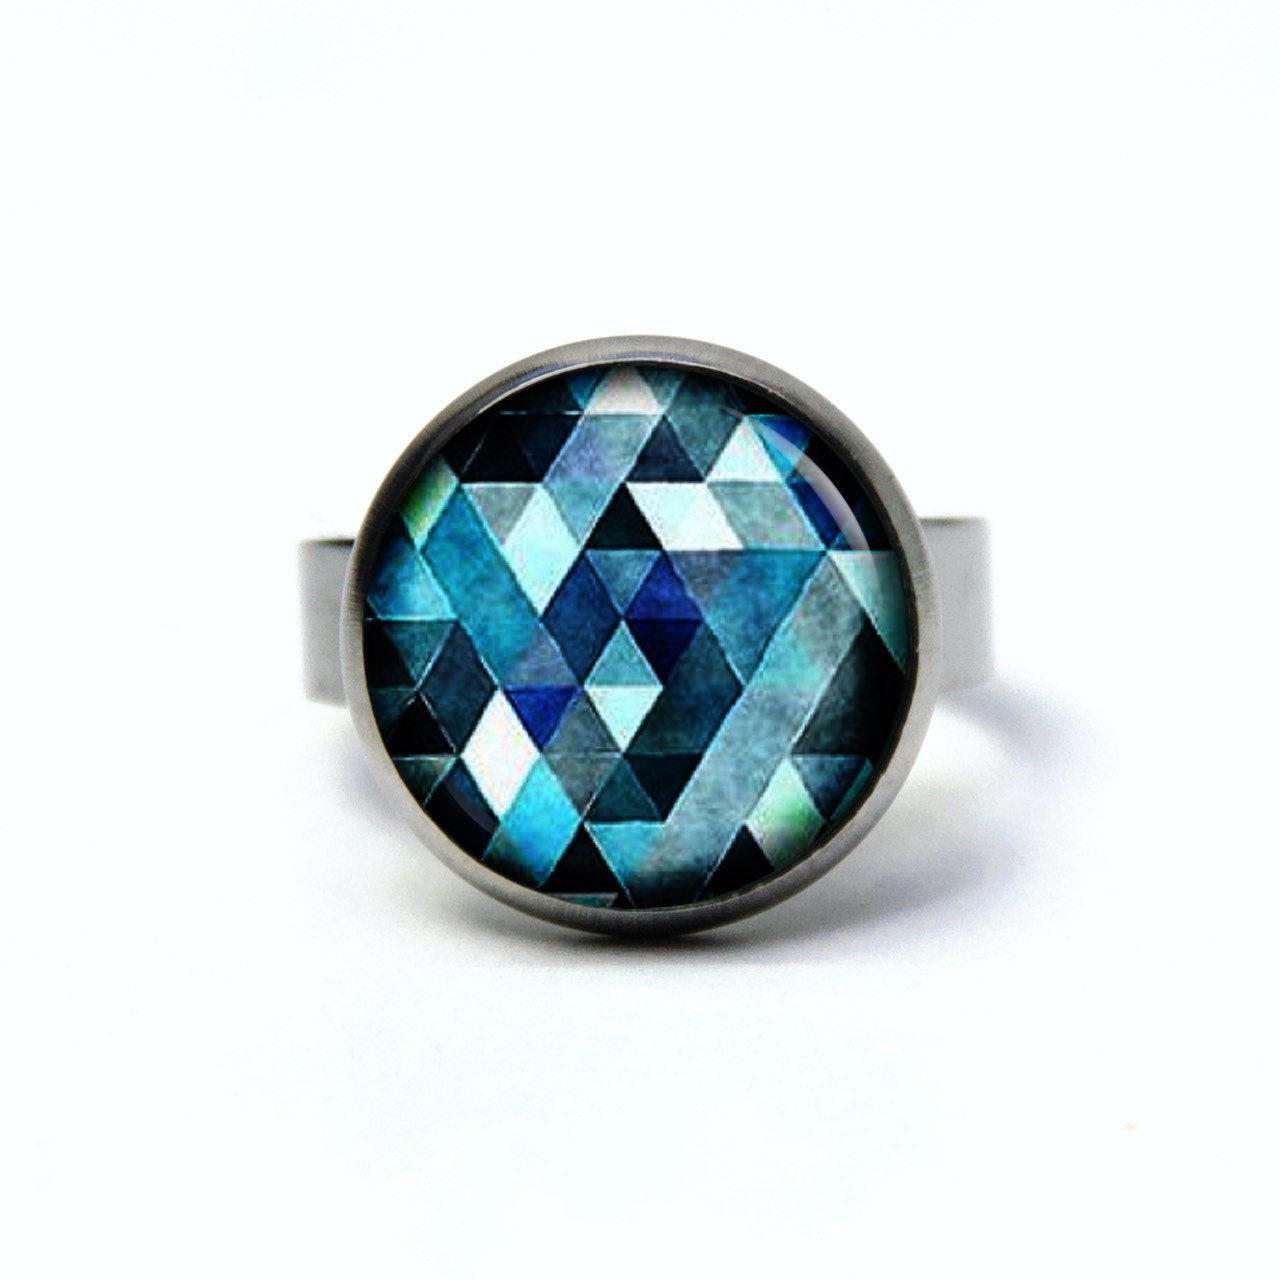 Edelstahl Ring blau Mosaik Mandala Rauten Kaleidoskop - verschiedene Größen